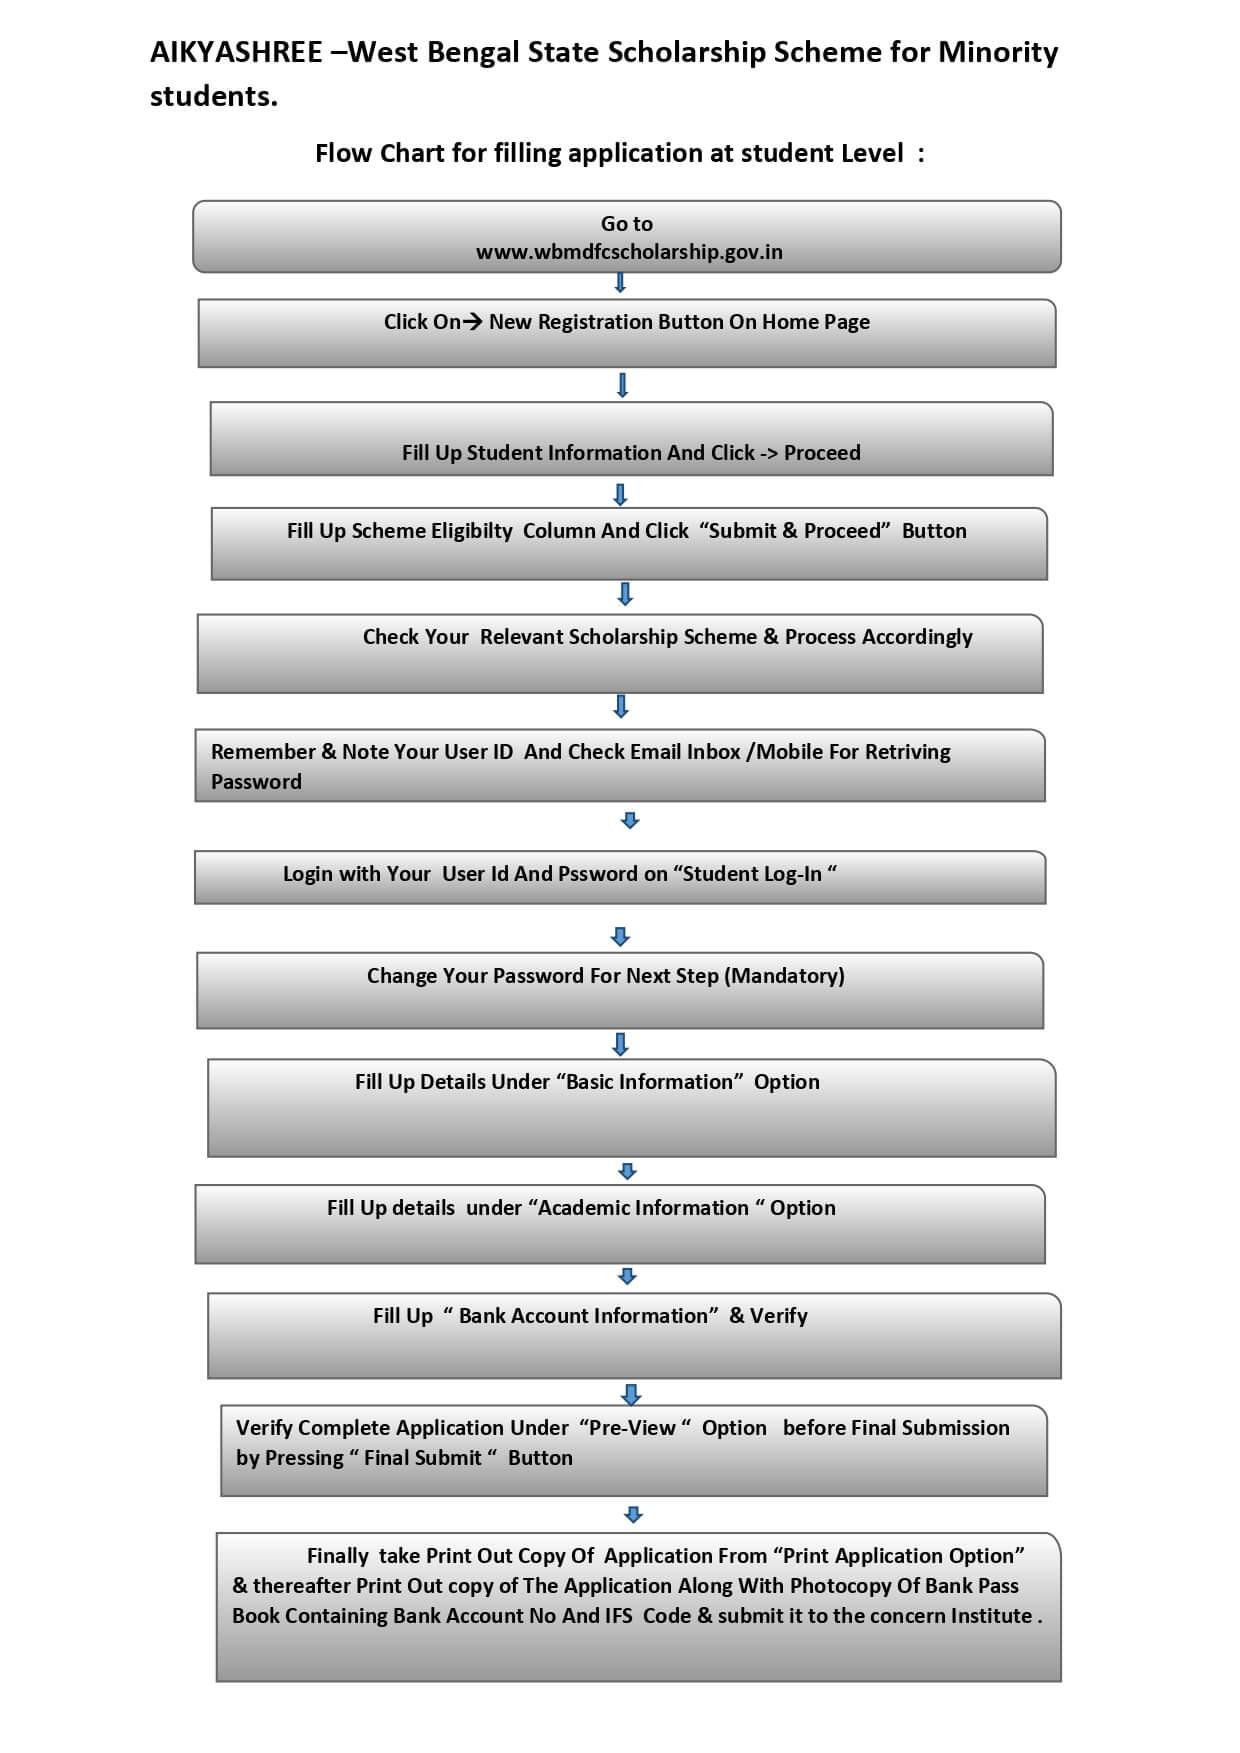 SWAMI VIVEKANANDA MERIT CUM MEANS SCHOLARSHIP SCHEME FOR MINORITIES (SVMCM) WEST BENGAL SCHOLARSHIP